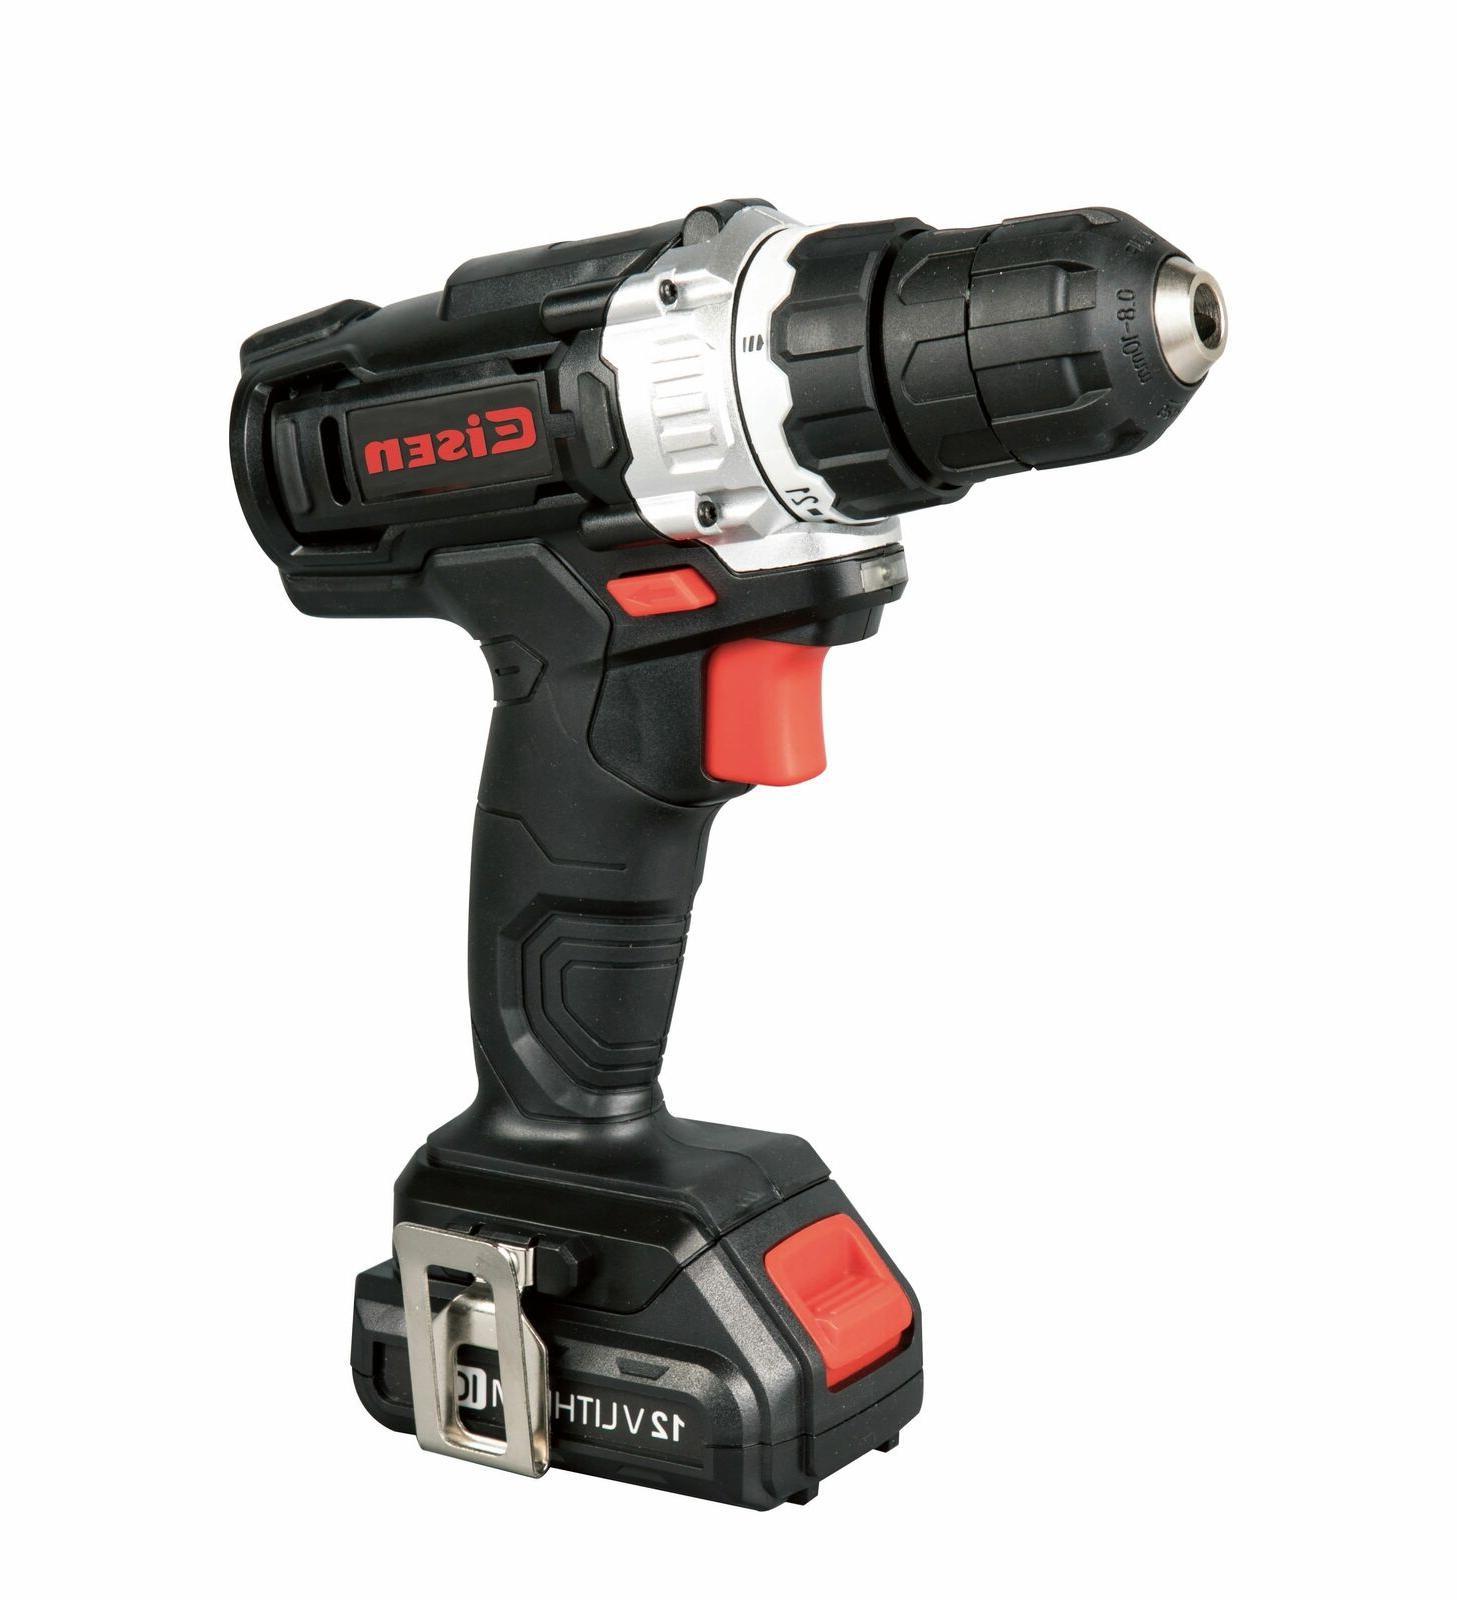 12v cordless 3 8 cordless drill 2